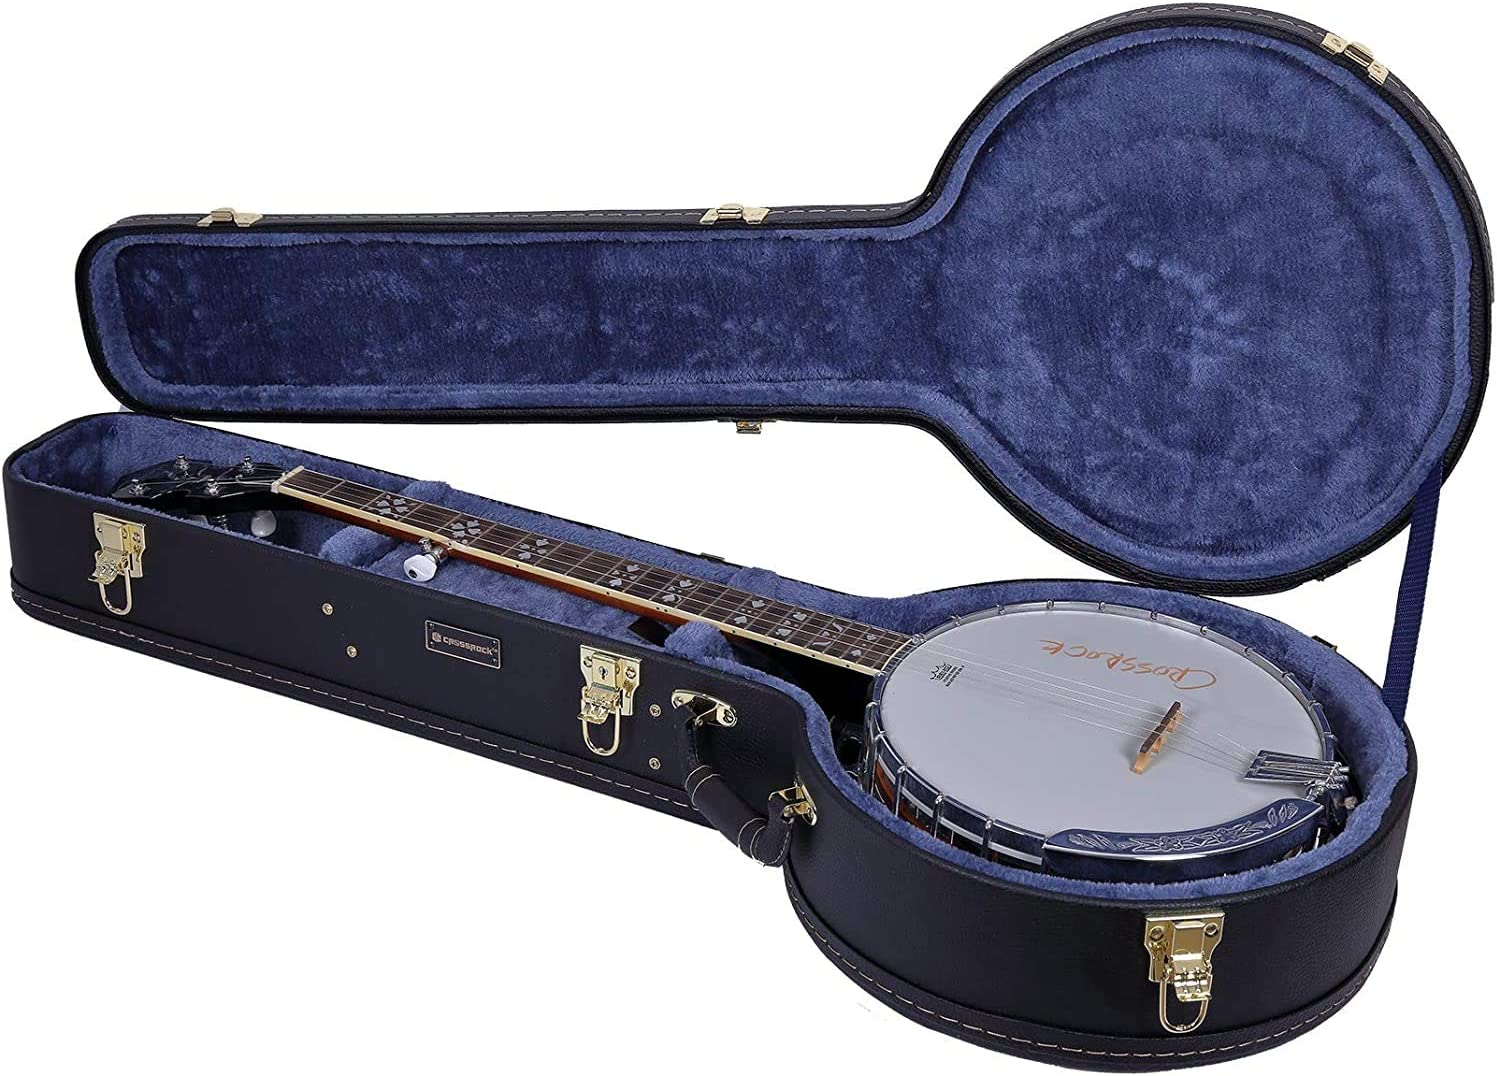 Crossrock CRW600BJBK Wooden case for 5 Resonator 高品質新品 売買 Banjo C String